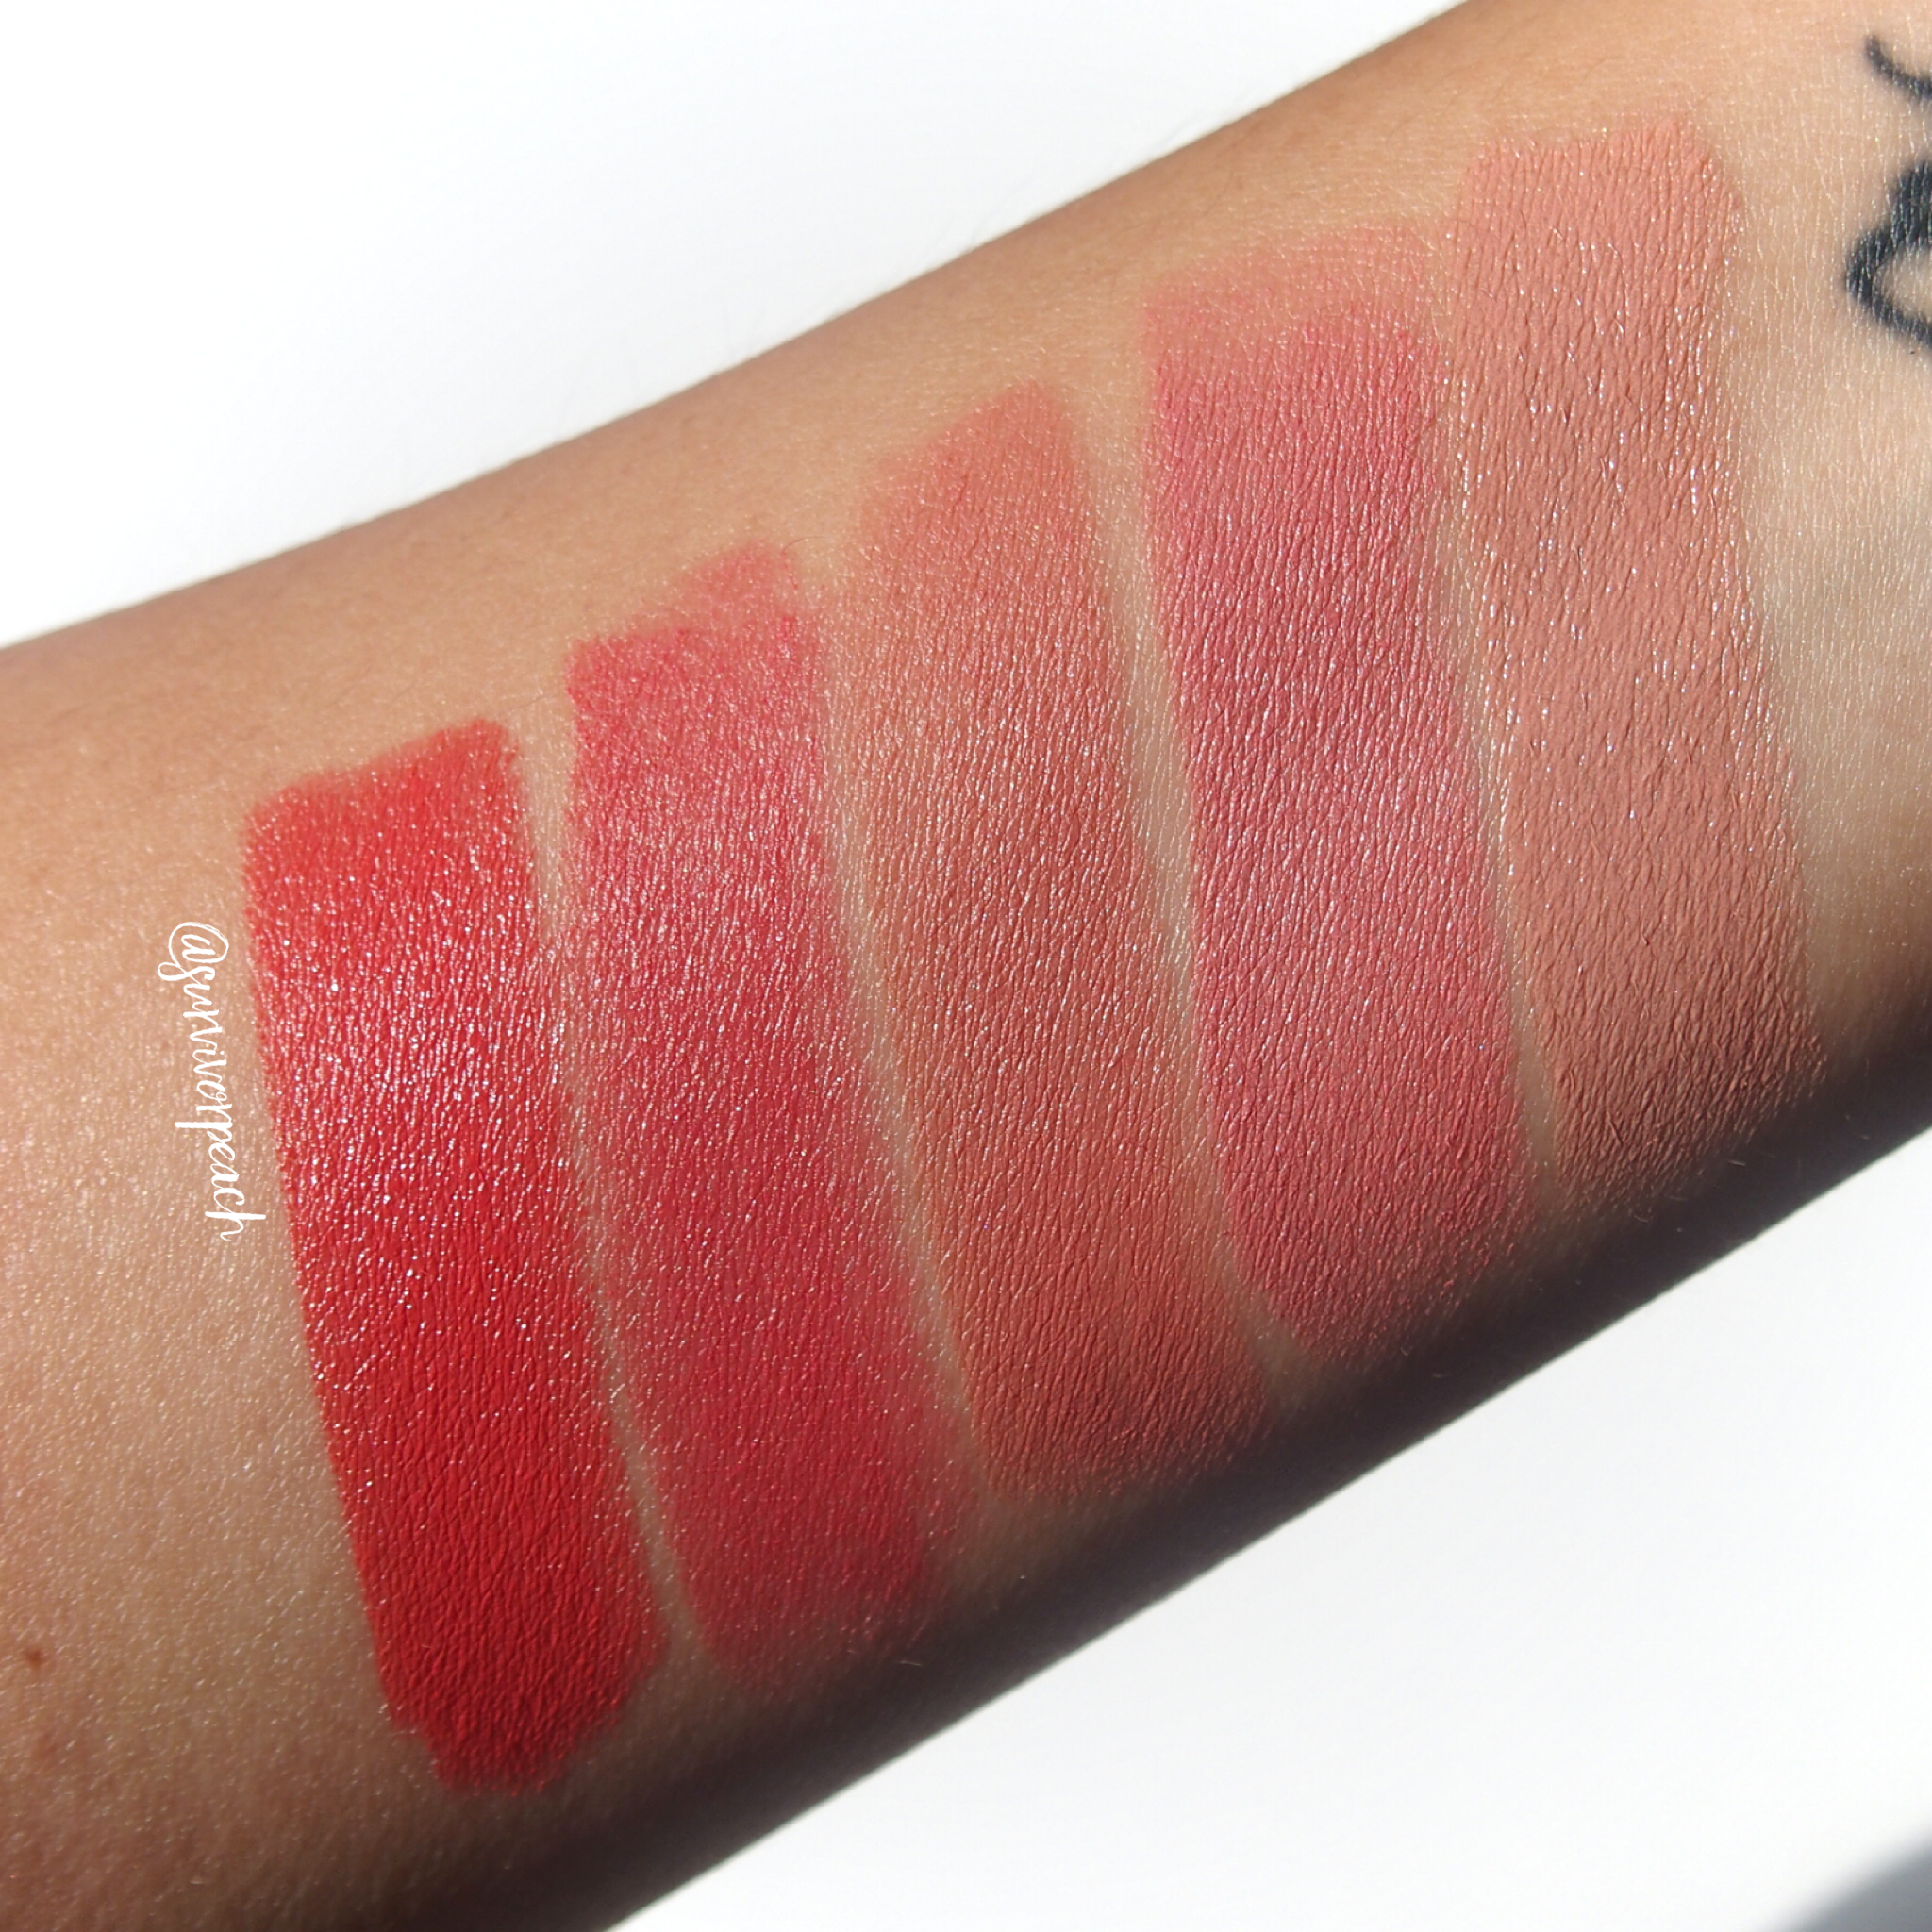 Swatches of the Charlotte Tilbury Hot Lips in shades Kim K.W., Kidman's Kiss, Super Cindy, Miranda May, Hot Emily.